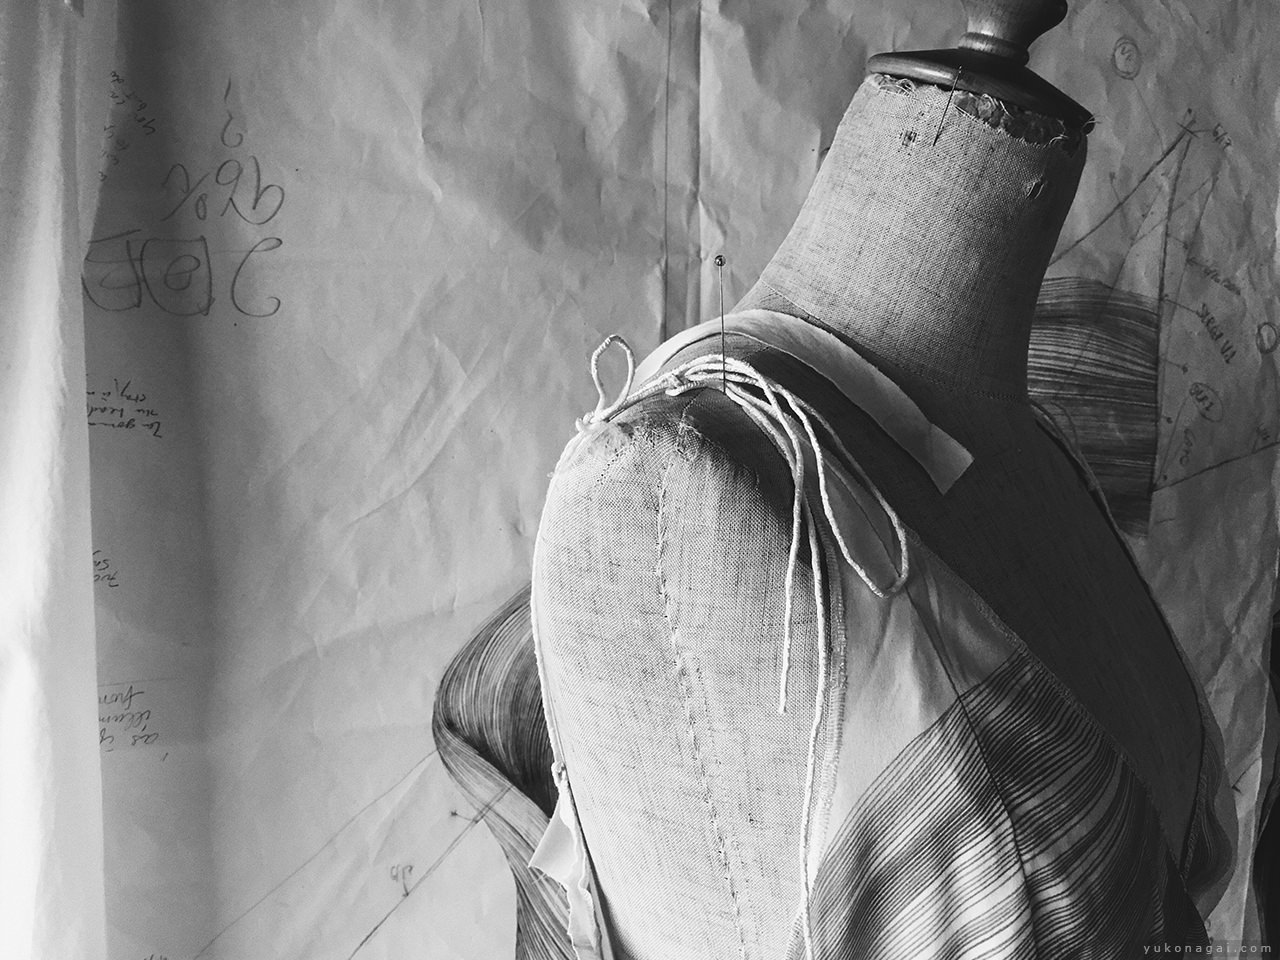 Textile art work in studio.